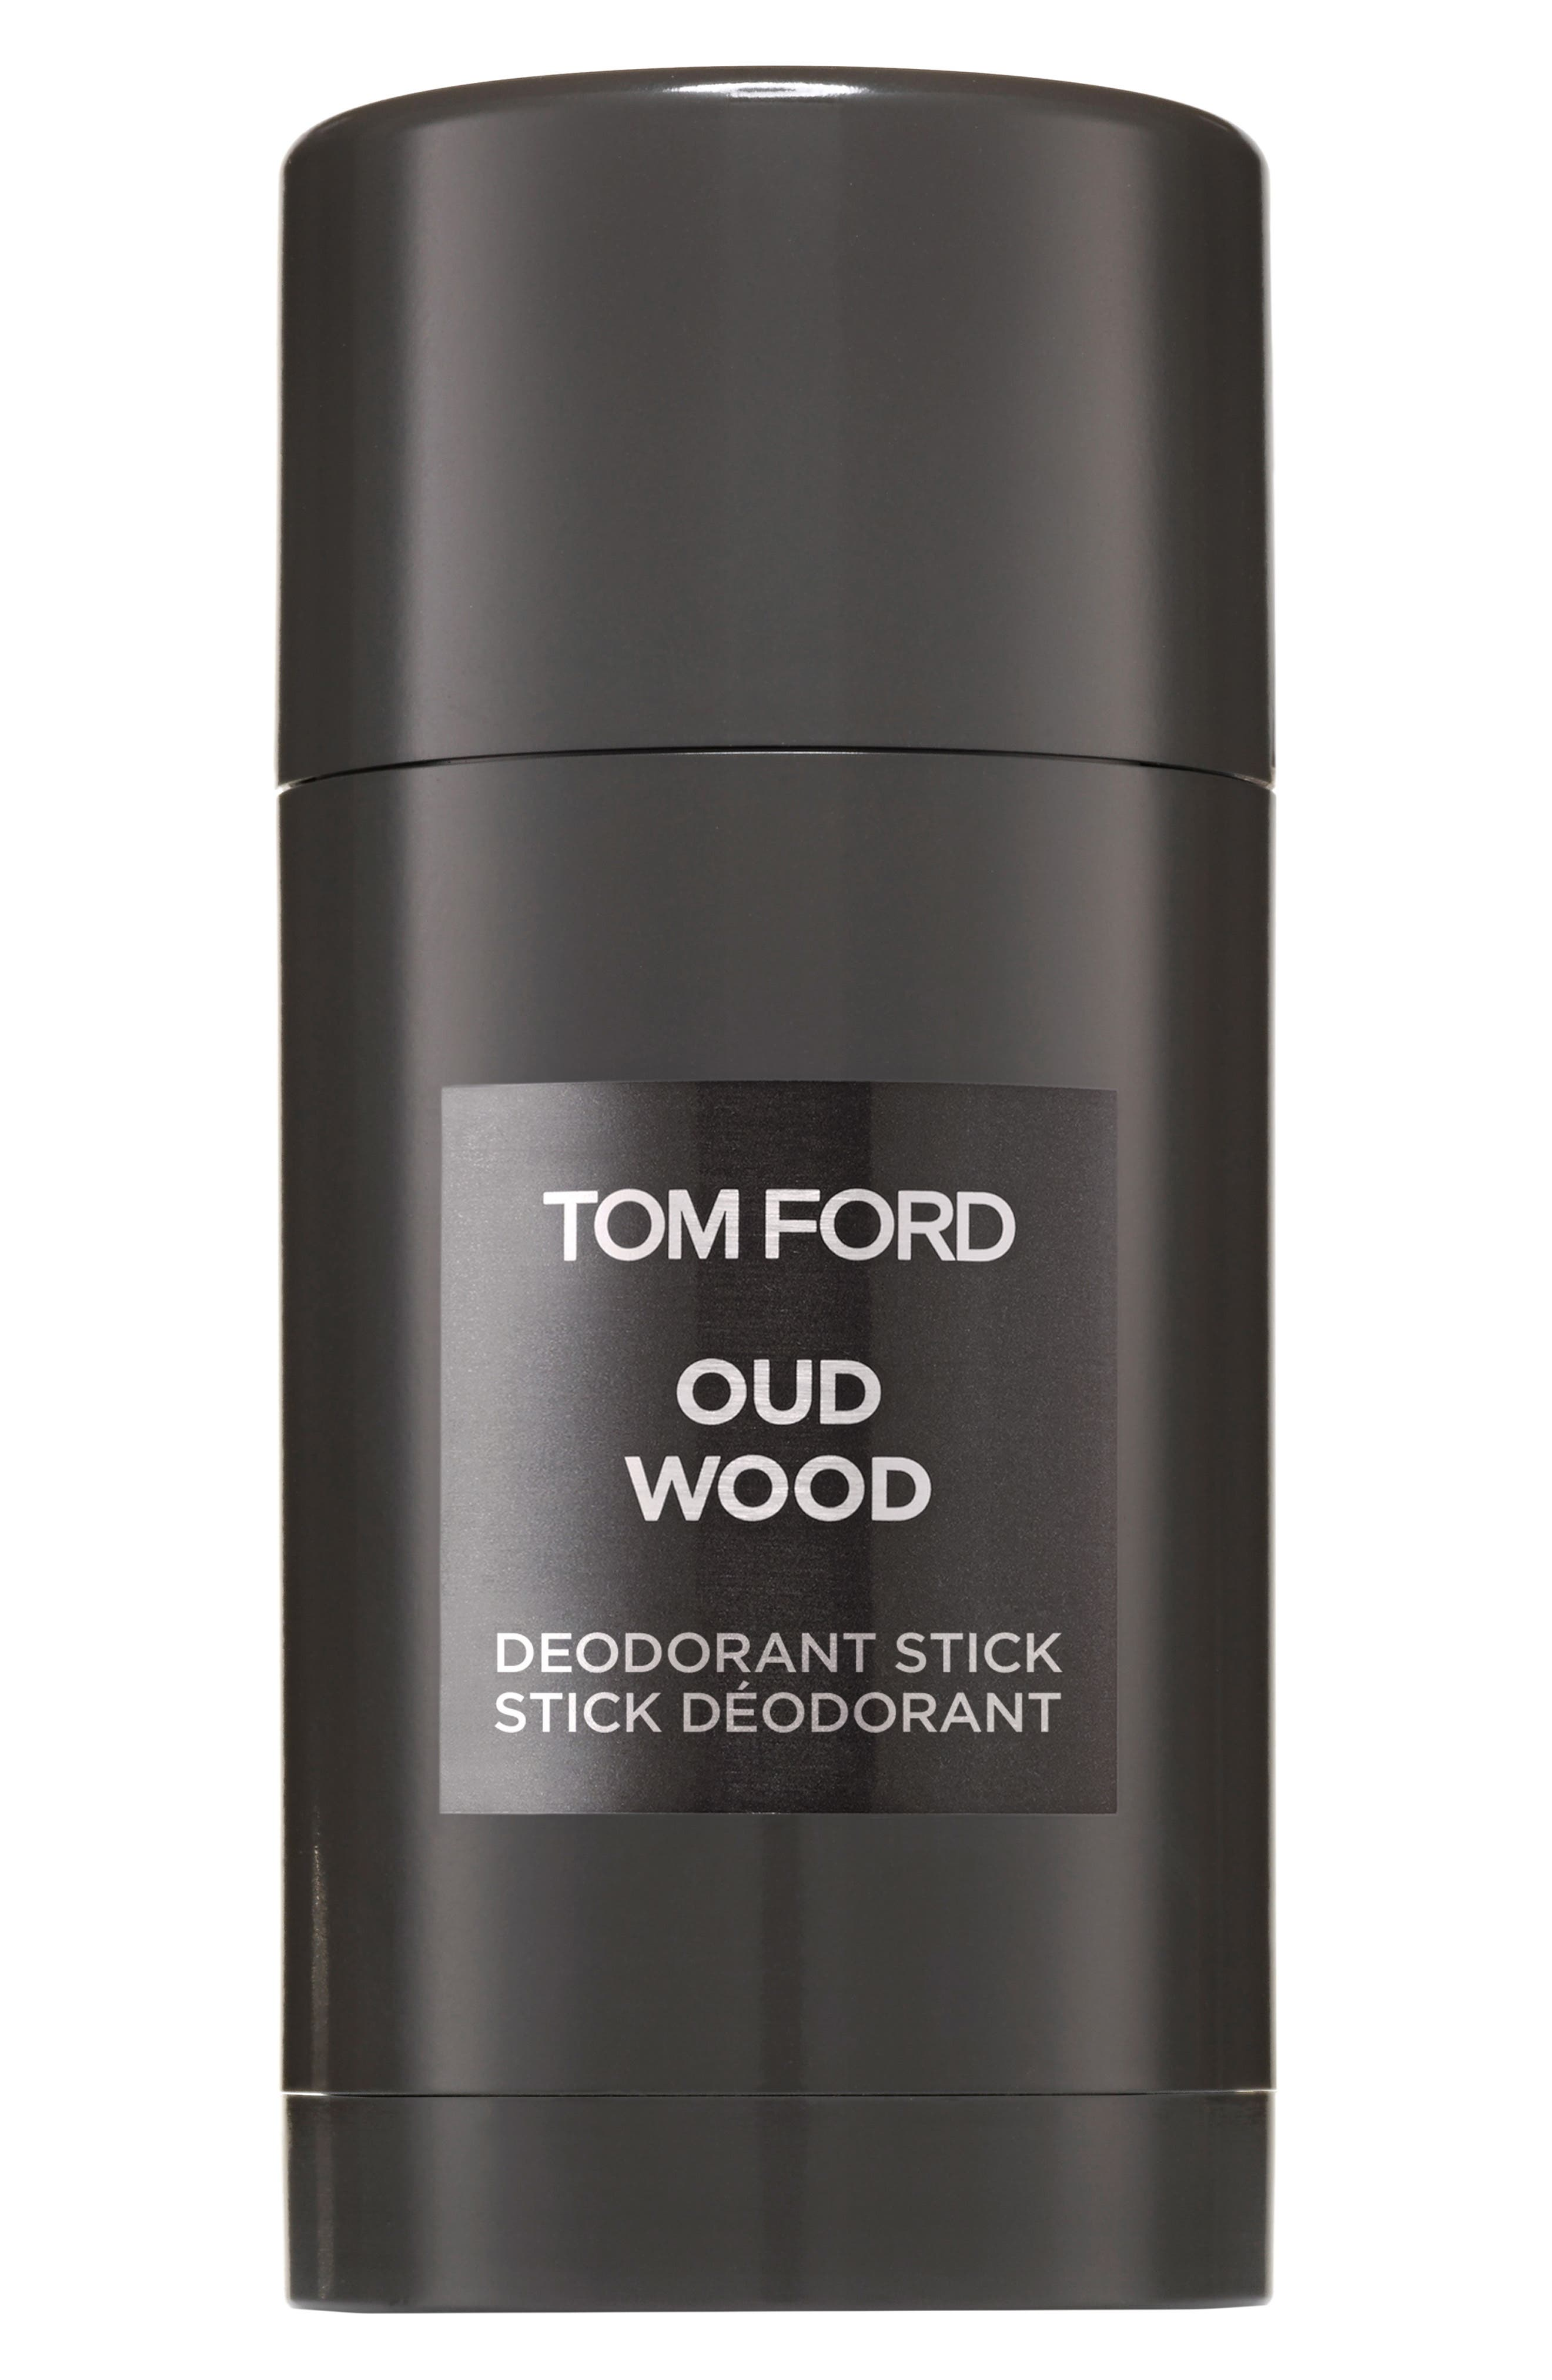 Tom Ford 'Oud Wood' Deodorant Stick